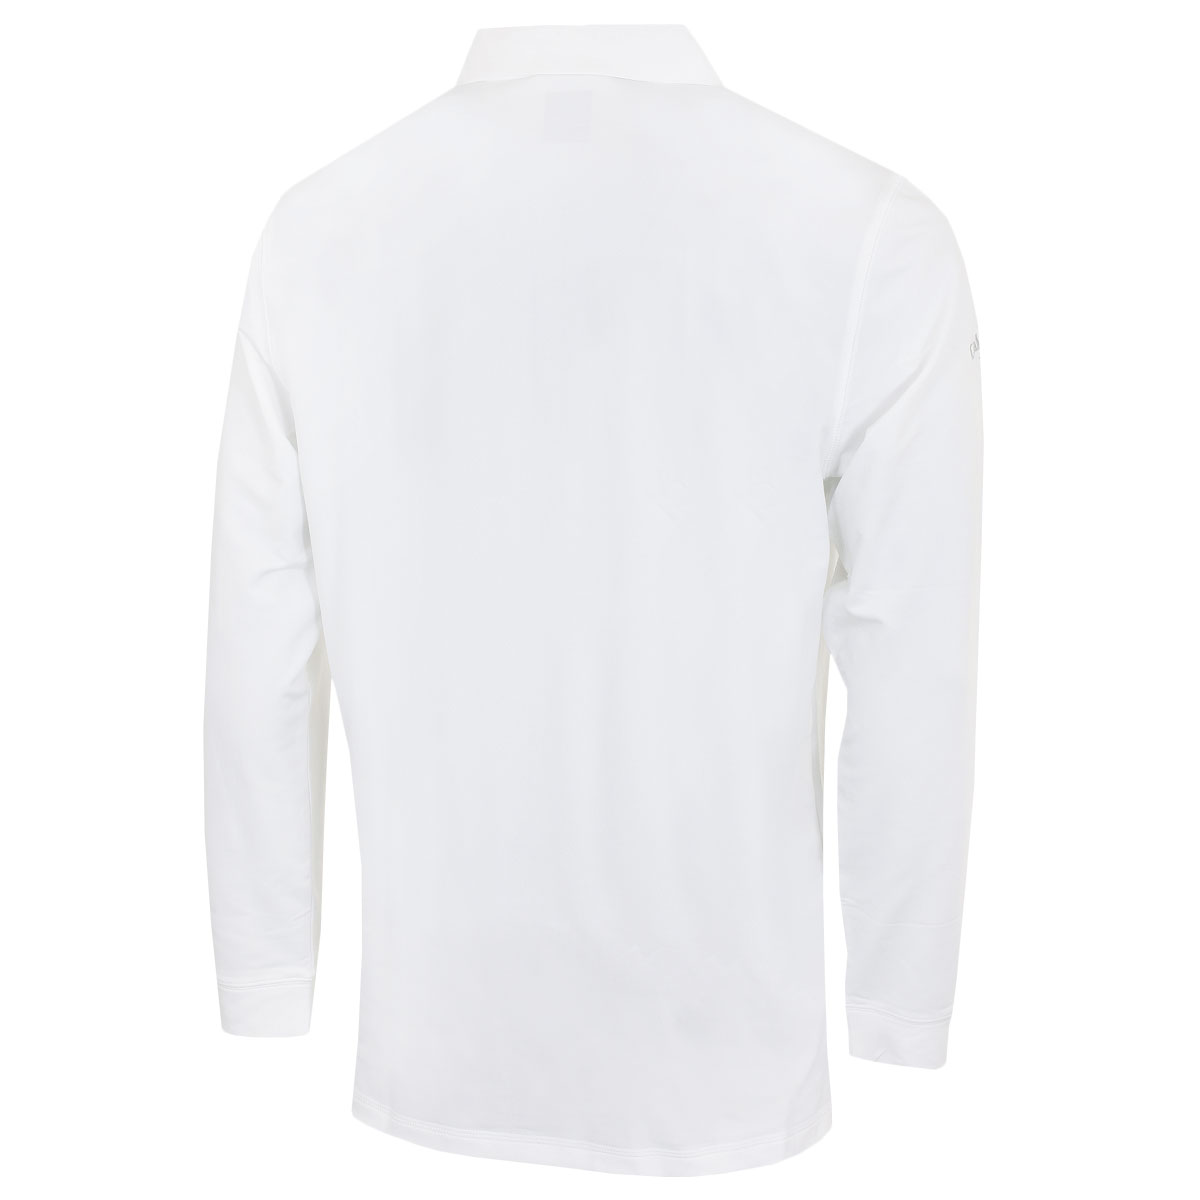 Callaway-Golf-Mens-2019-Long-Sleeve-Stretch-Opti-Dri-Polo-Shirt thumbnail 6